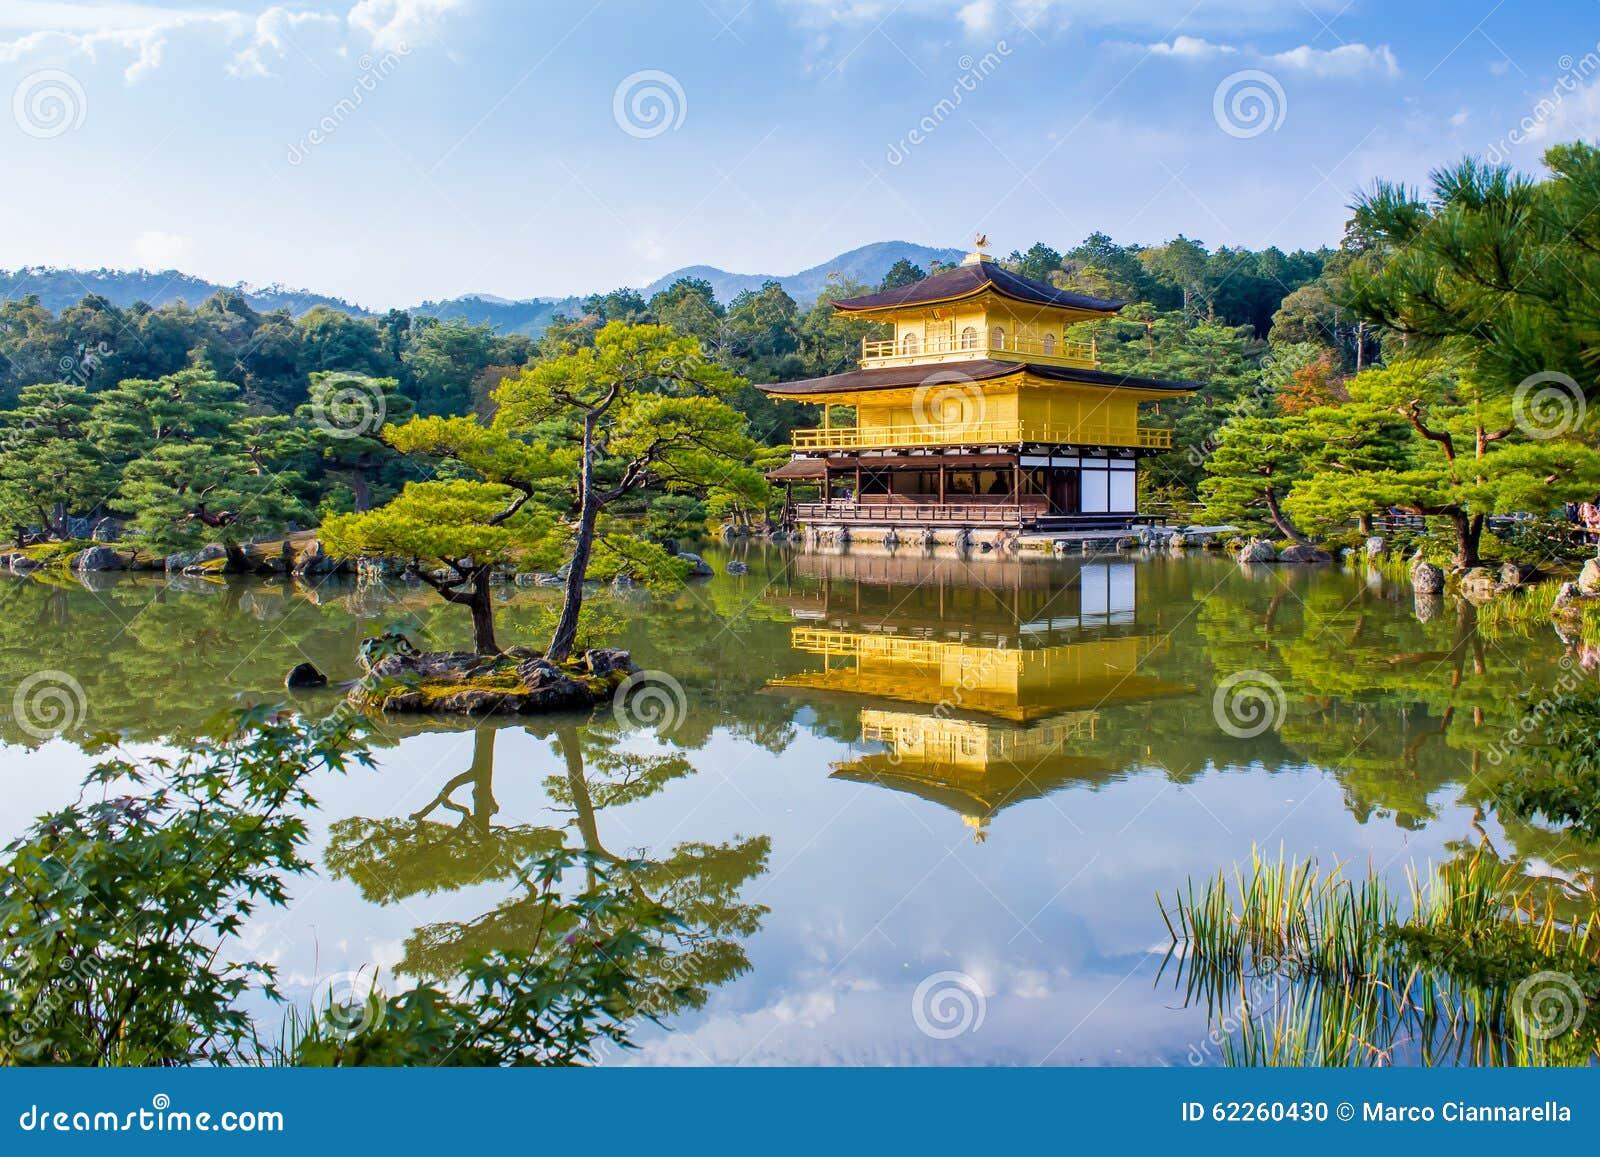 pin golden pavilion kyoto - photo #26